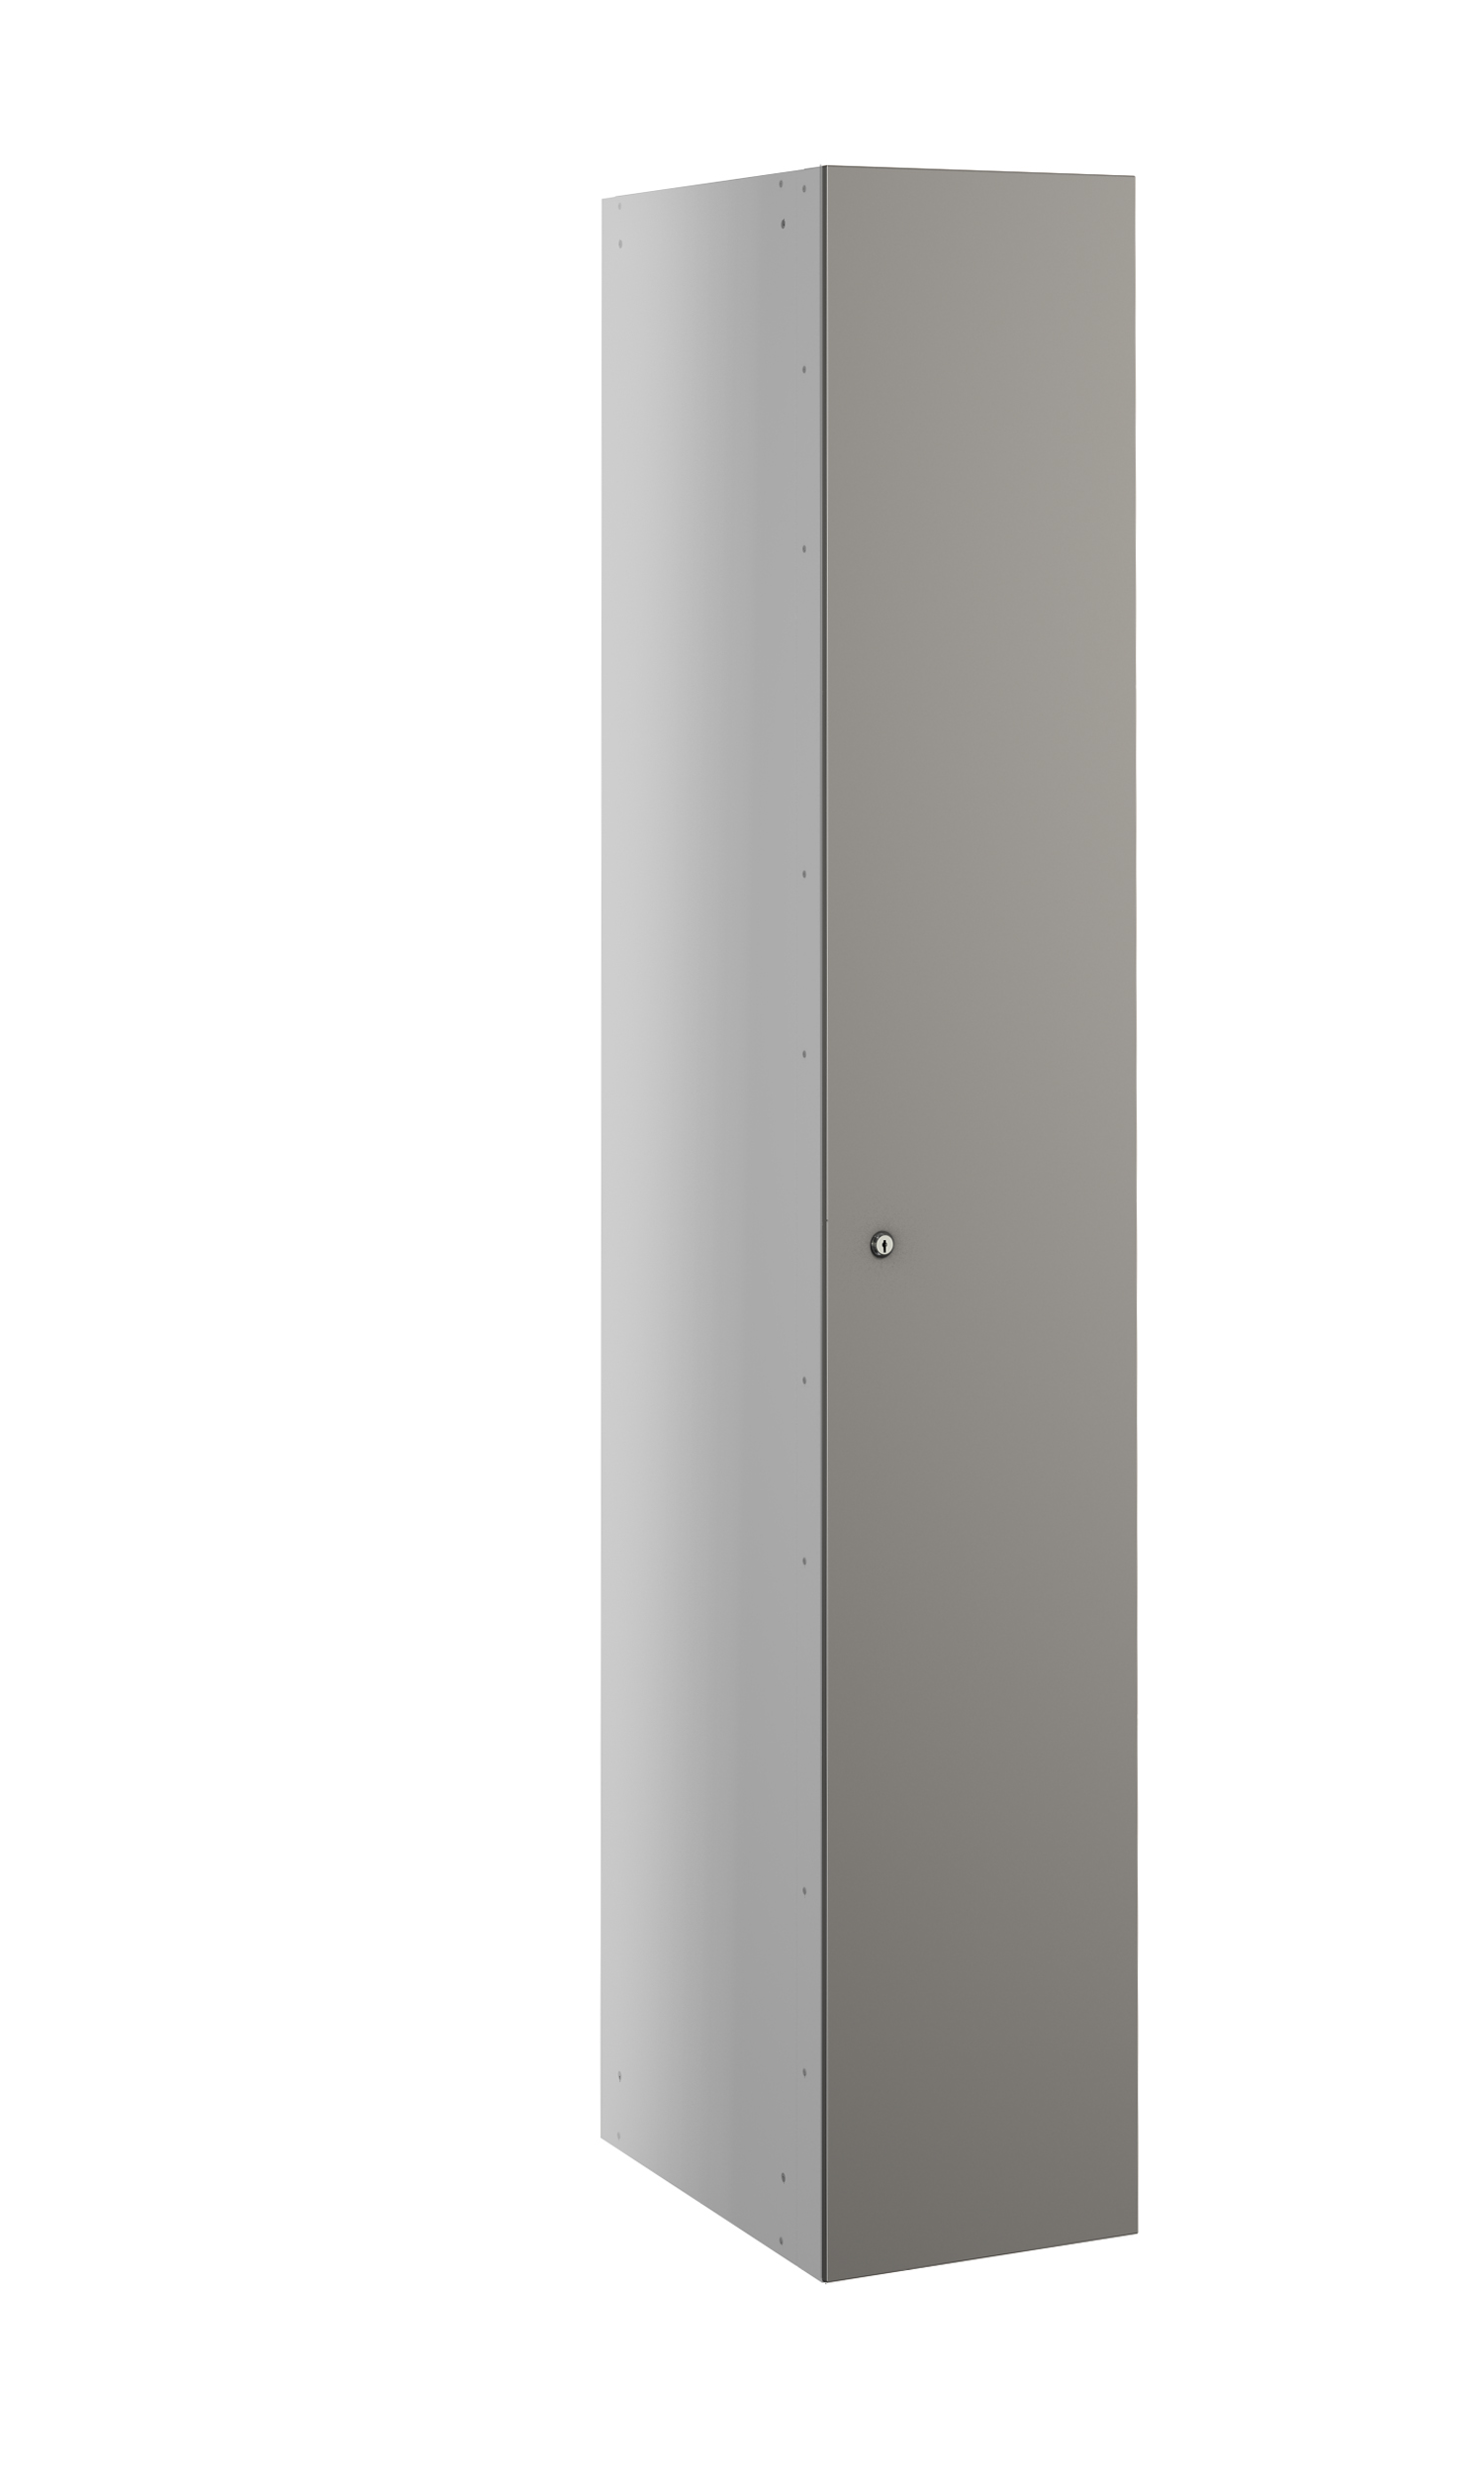 Probe buzzbox laminate 1 door grey